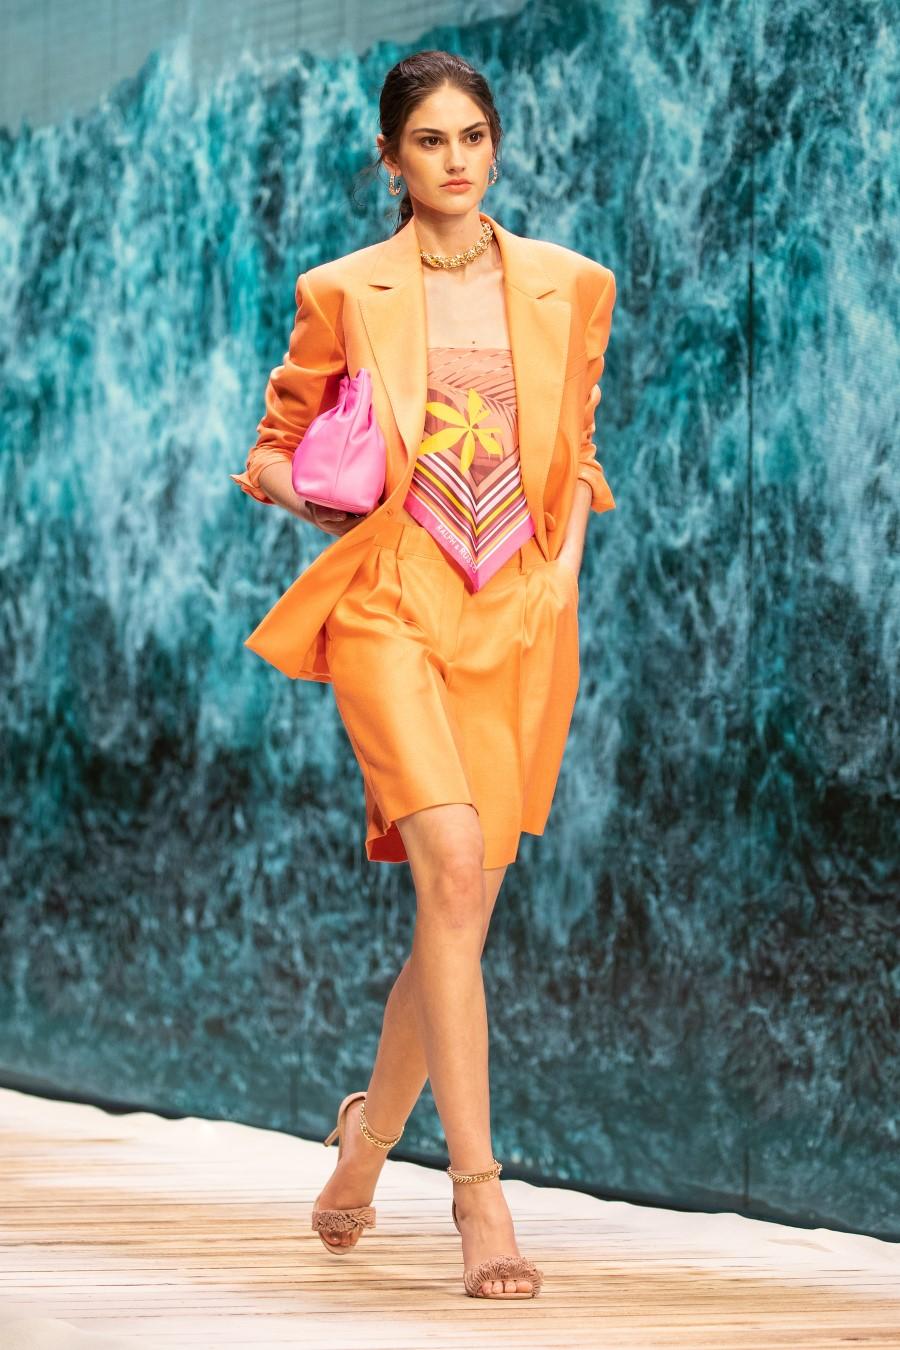 Ralph & Russo - Spring-Summer 2021 - Paris Fashion WeekRalph & Russo - Spring-Summer 2021 - Paris Fashion Week